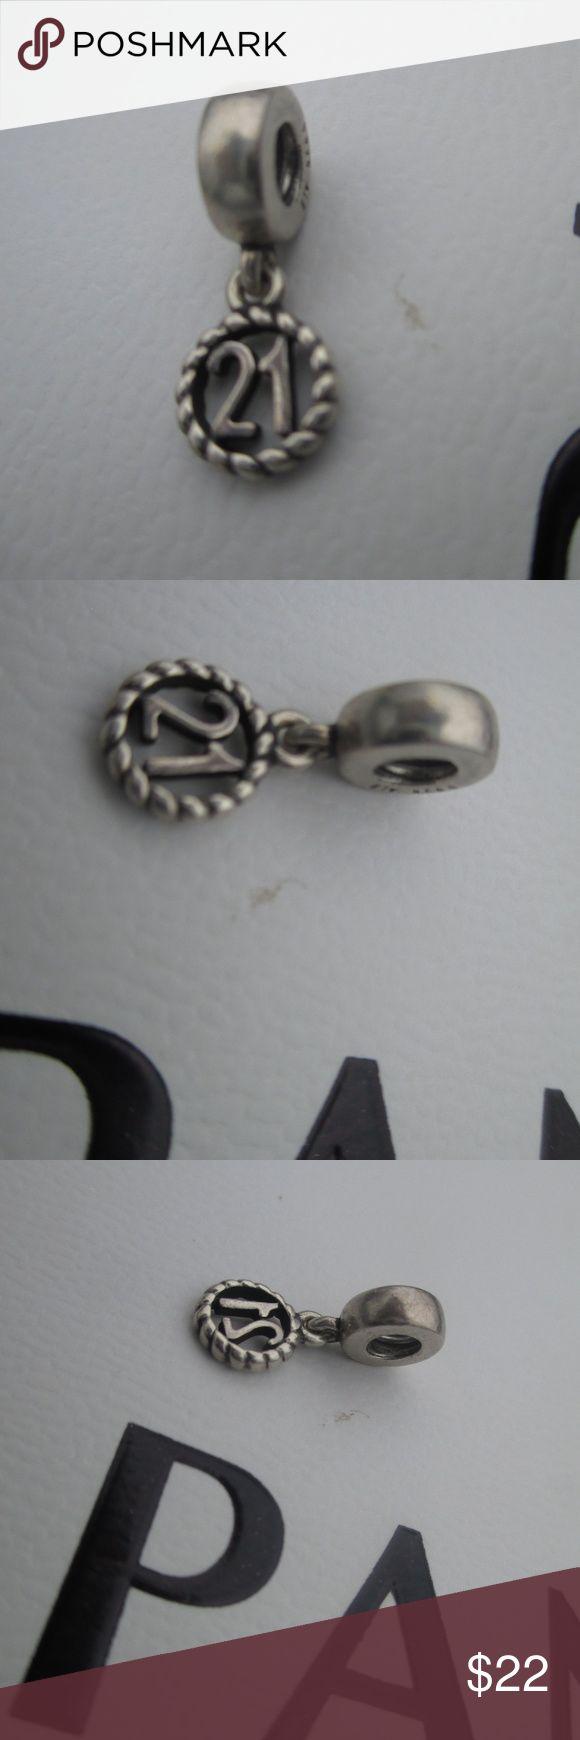 PANDORA 925 ALE STERLING SILVER DANGLE 21st 790496 AUTHENTIC PANDORA 925 ALE STERLING SILVER DANGLE 21st BIRTHDAY CHARM 790496 pandora Jewelry Bracelets #pandorajewelry